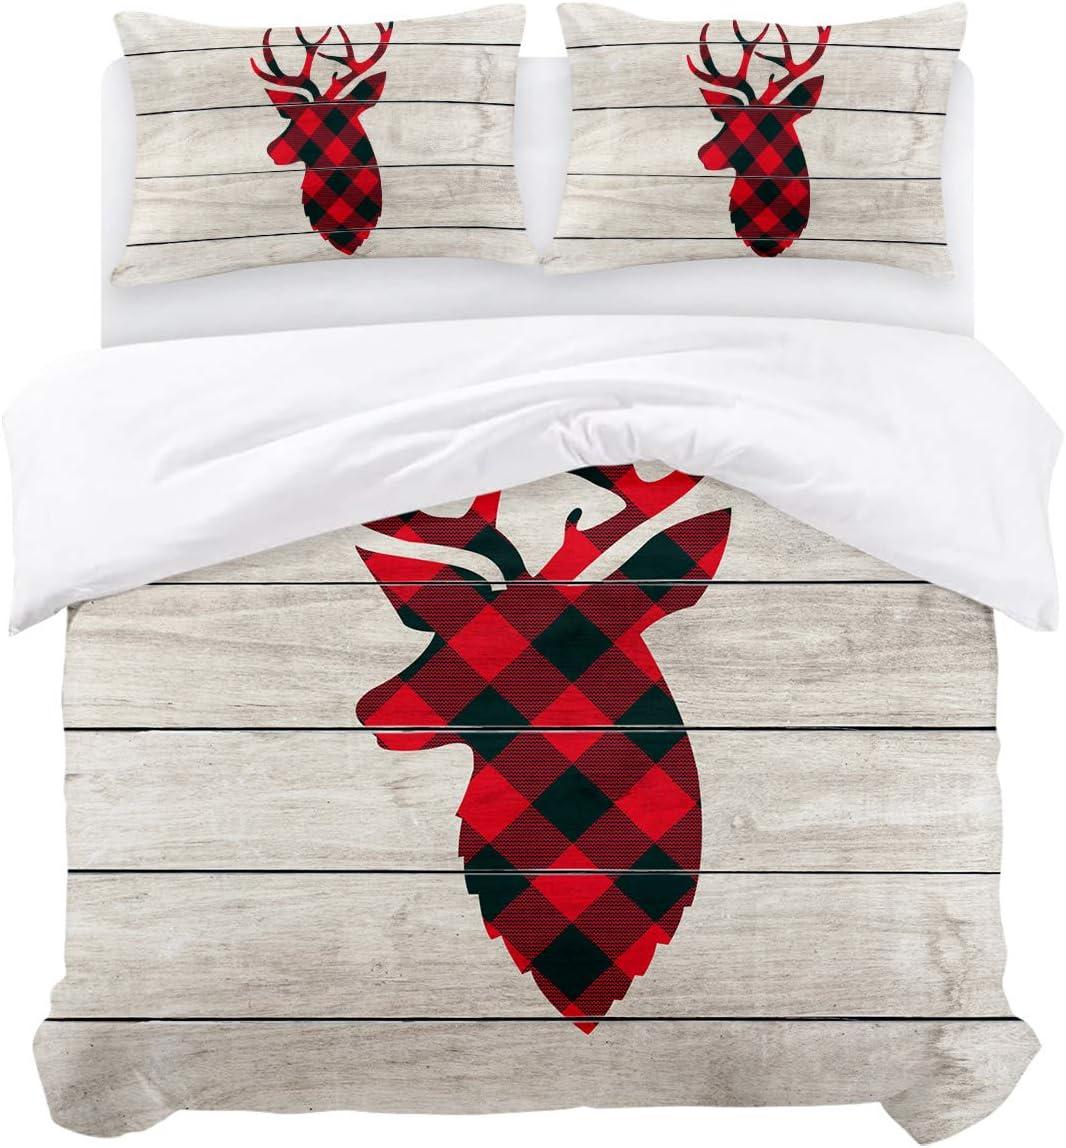 Bedding Memphis Mall Sets of Genuine 3 Lightweight D Quilt Comforter Microfiber Down